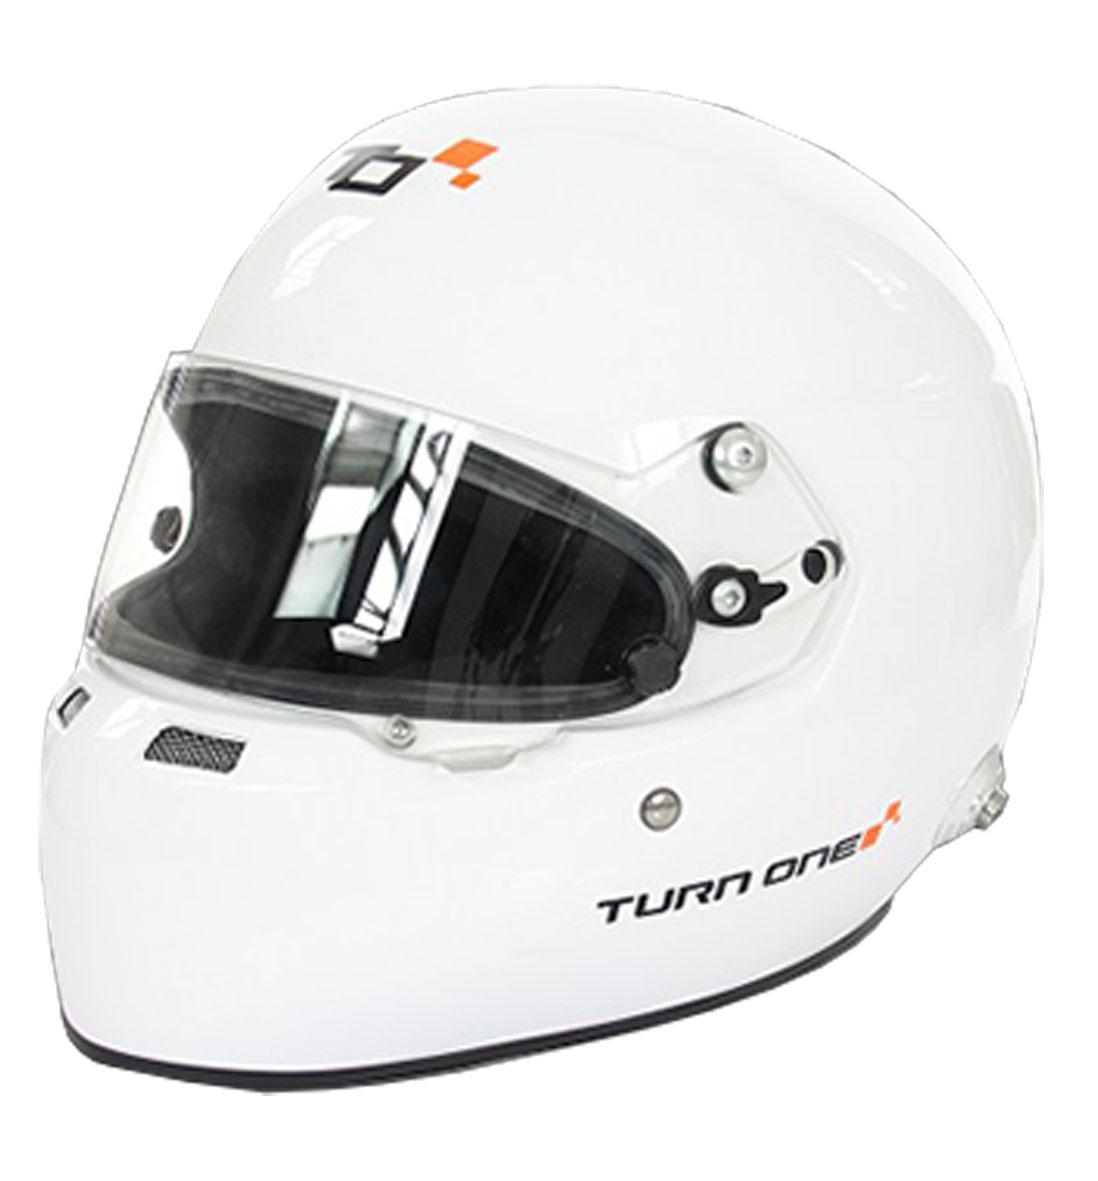 Turn One Full-RS Helmet | FIA8859-15  | White | Large (59)